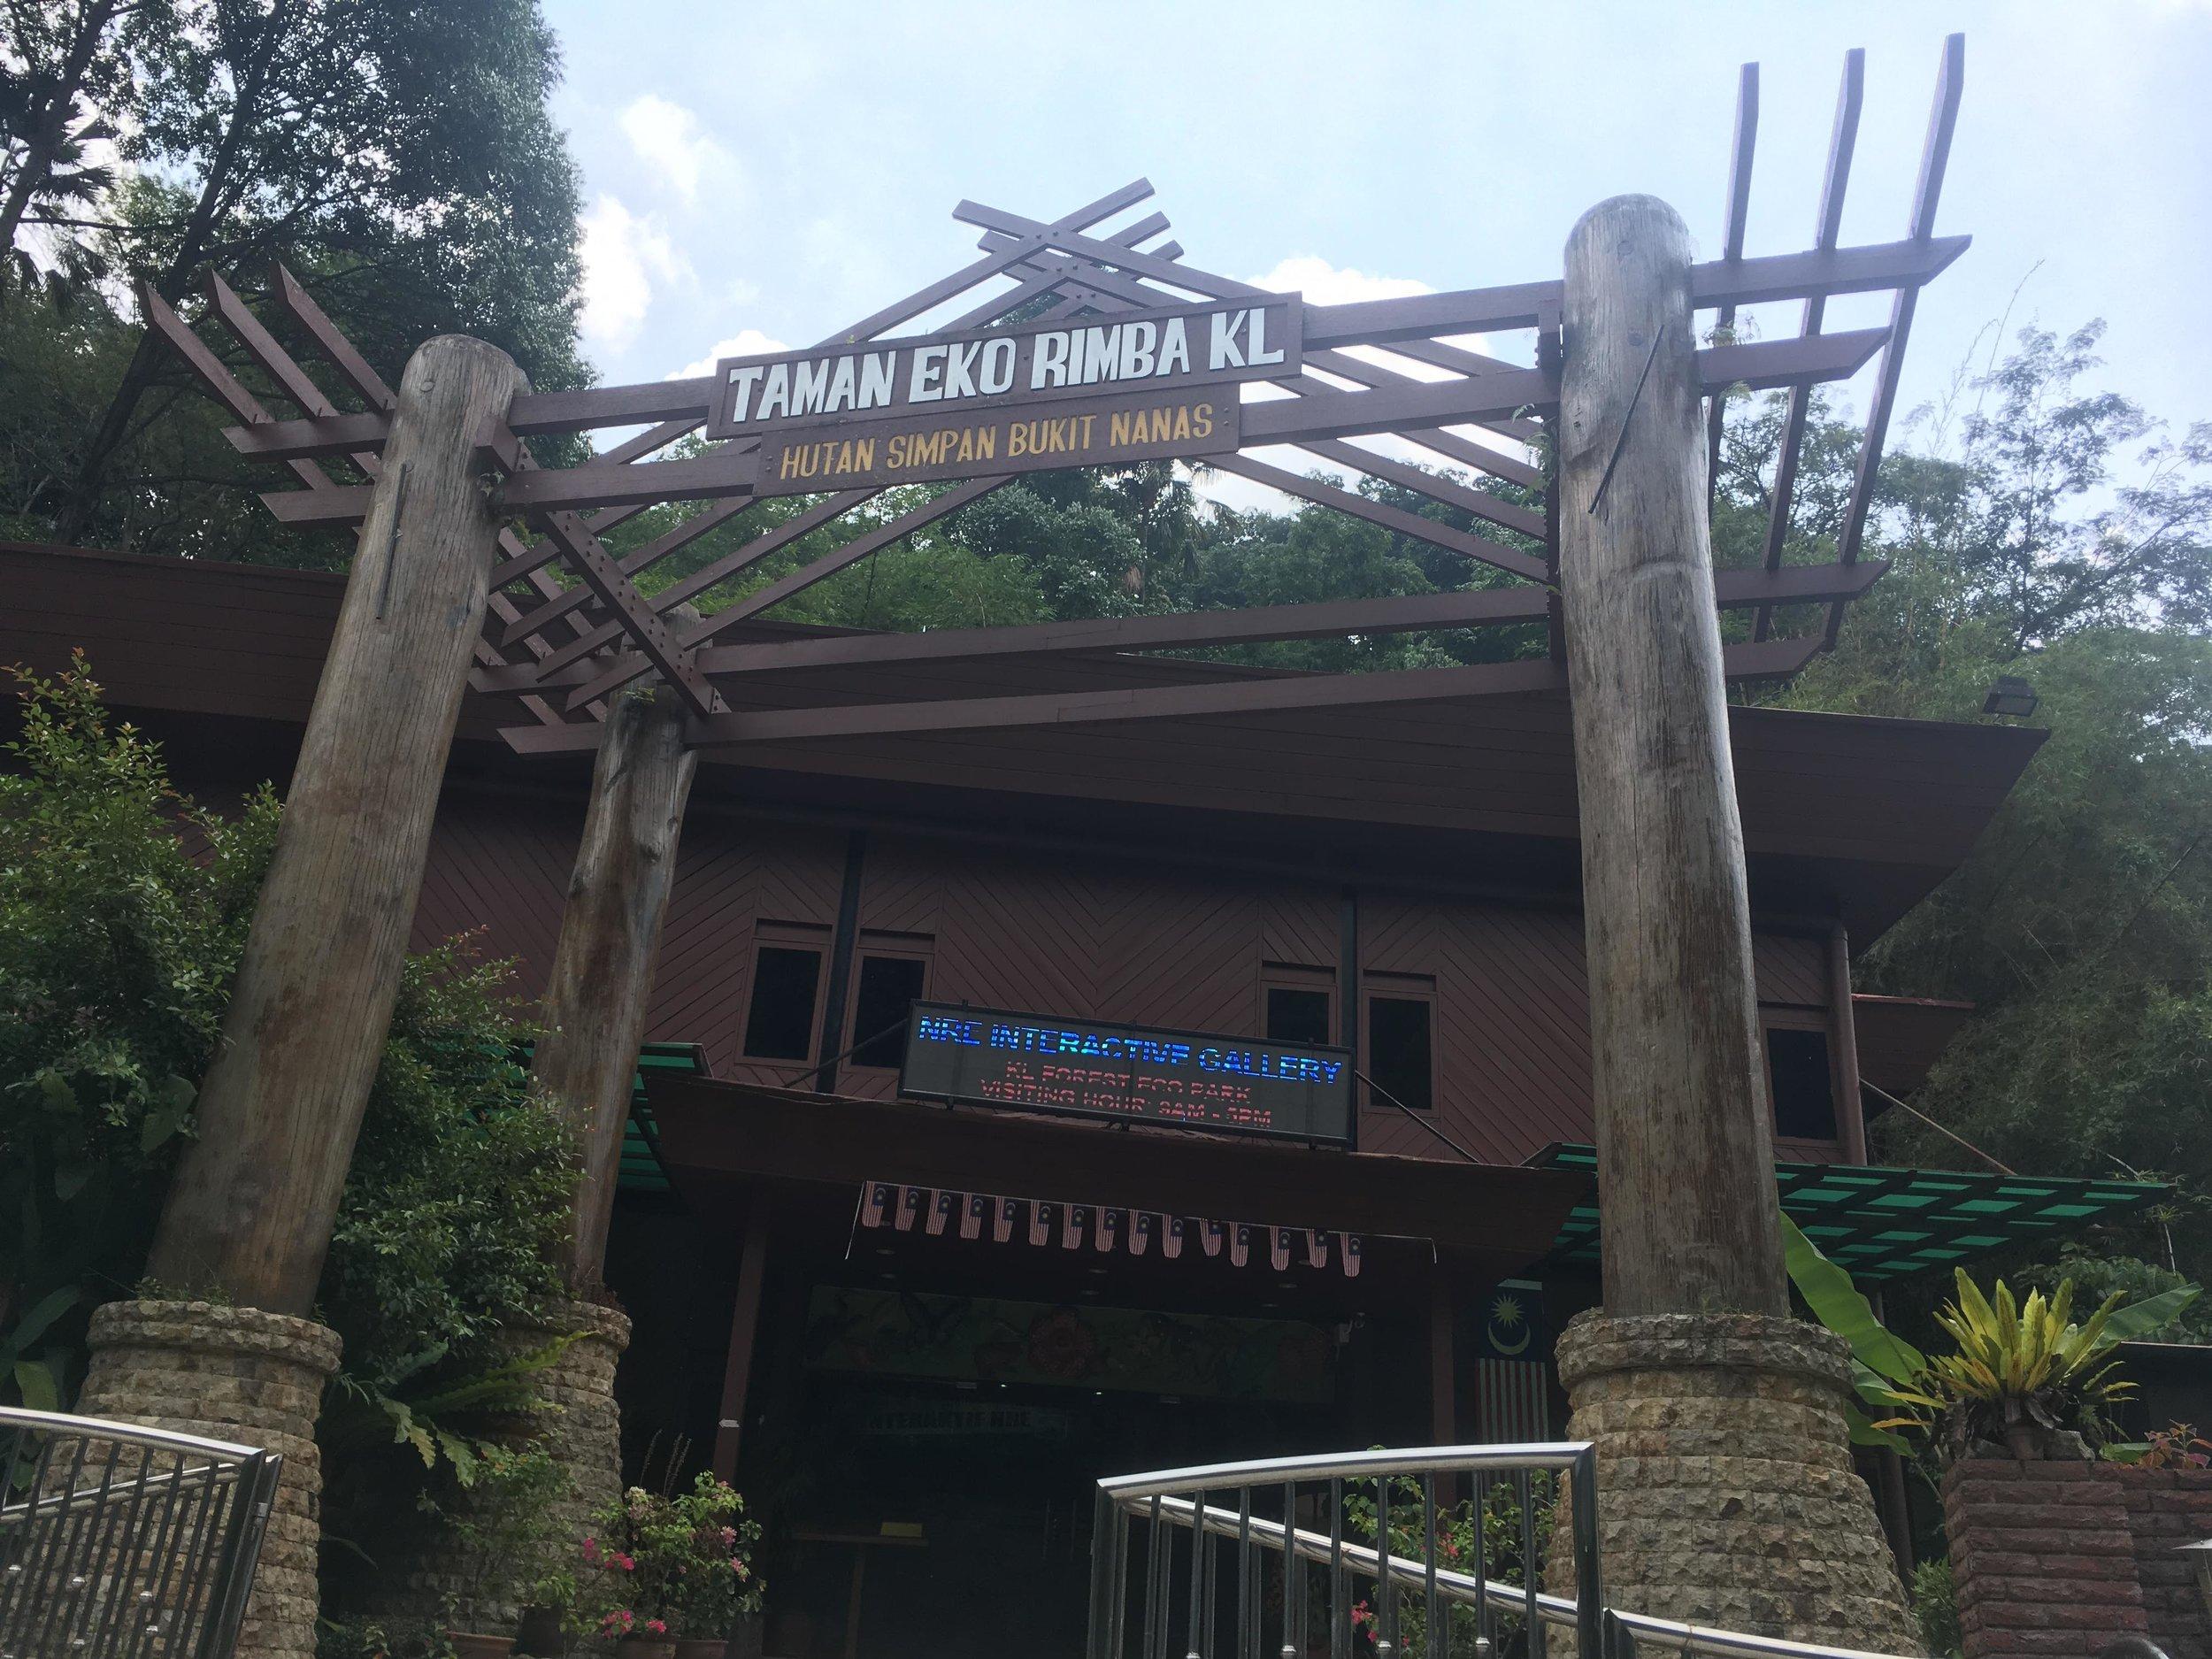 Bukit Nanas Eco Forest Park, Kuala Lumpur, Malaysia